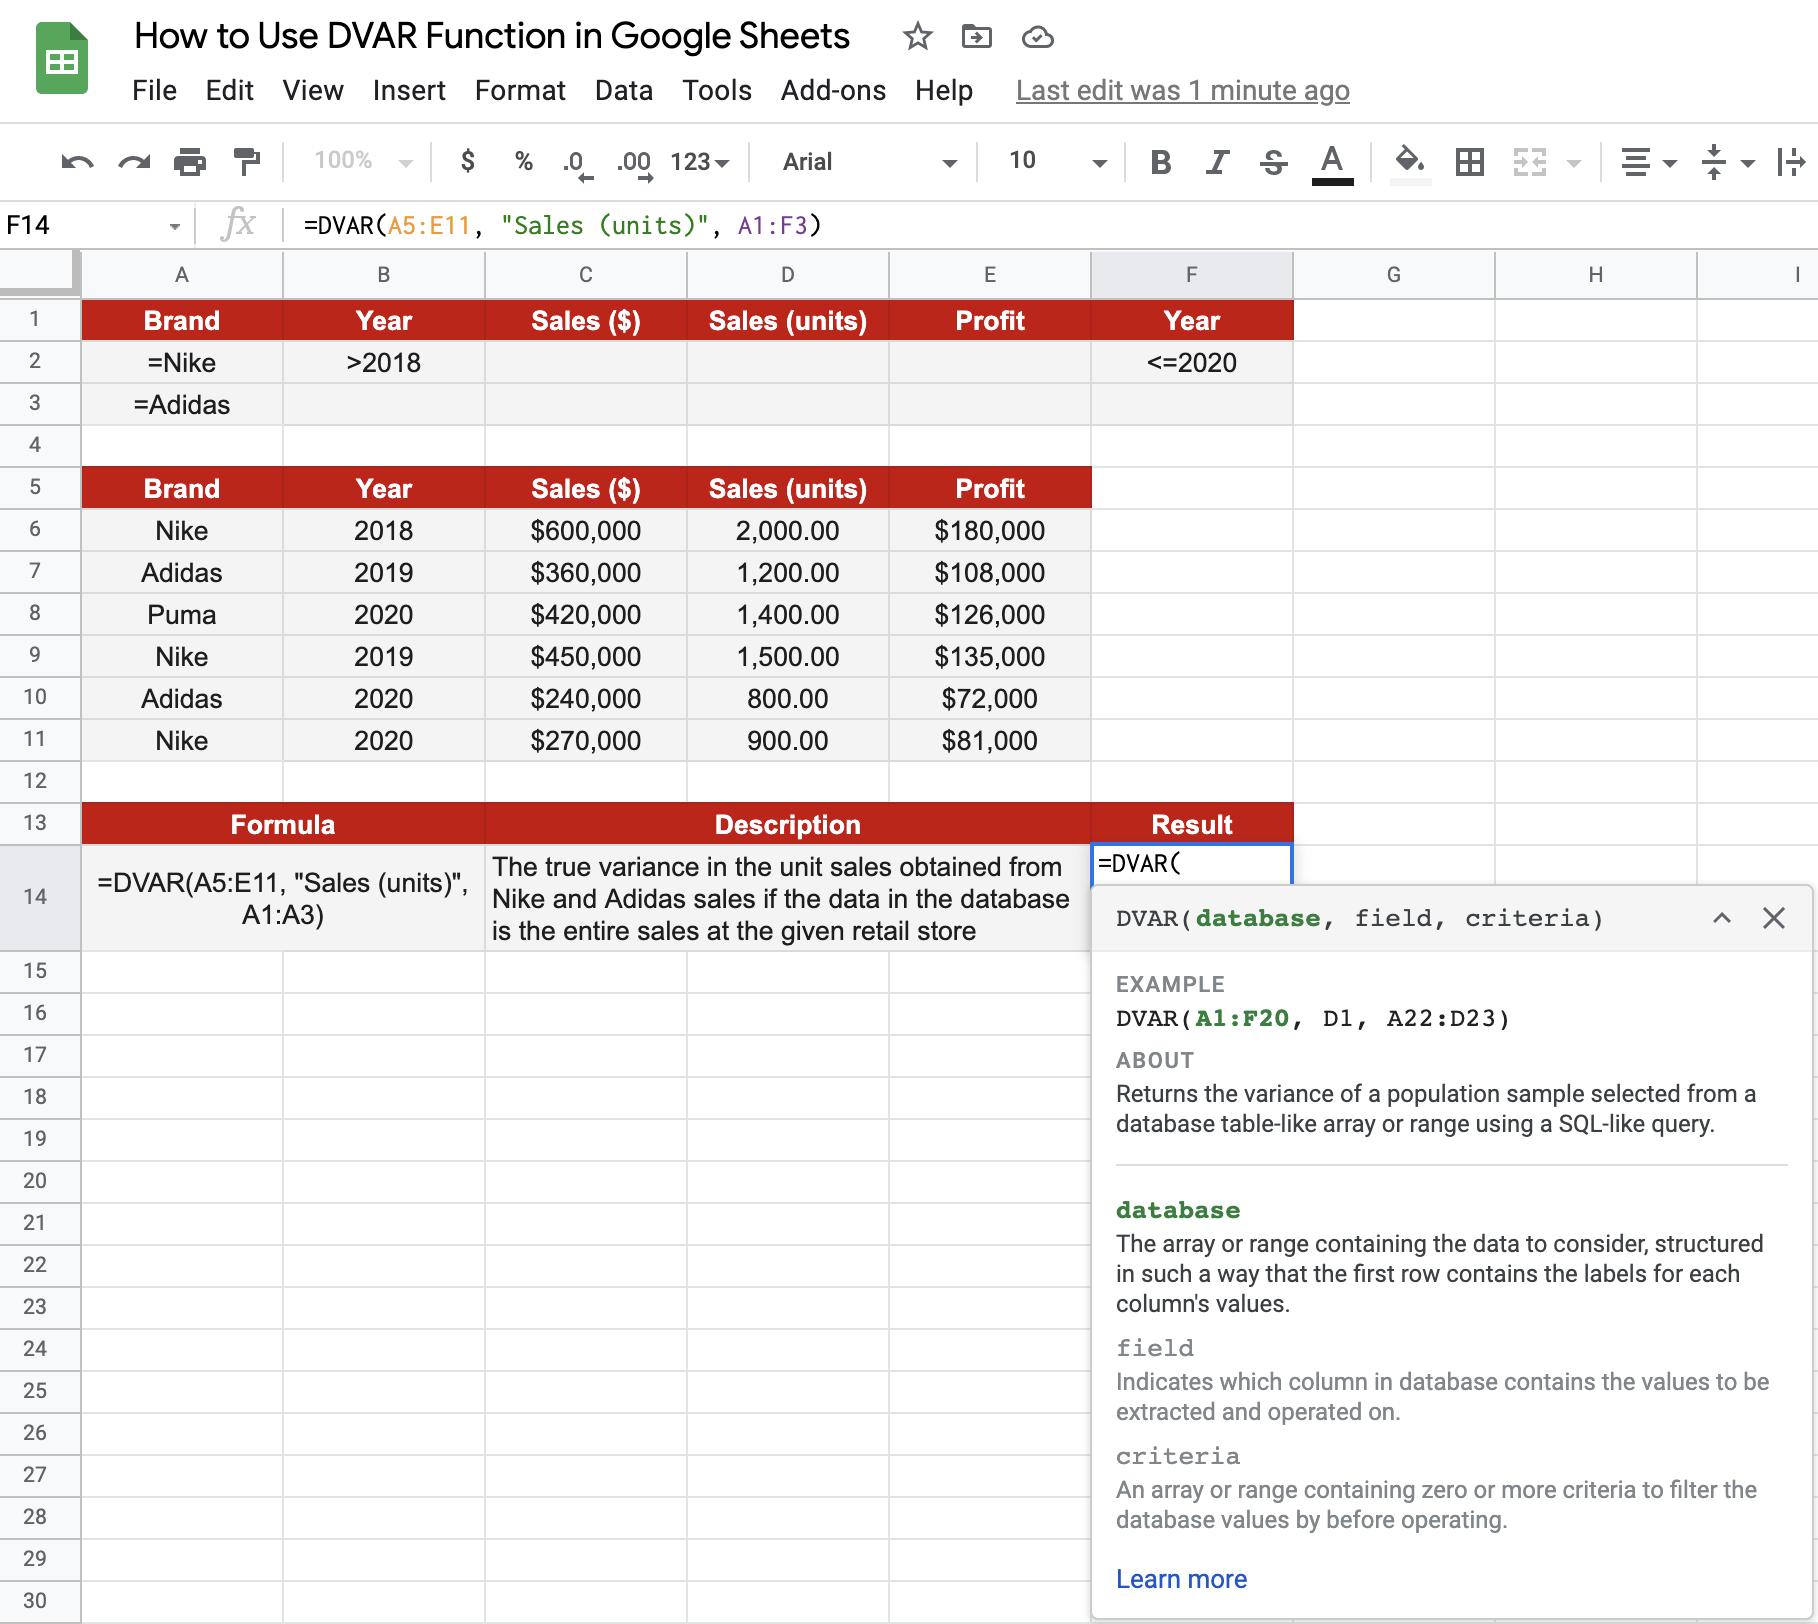 DVAR() in Google Sheets